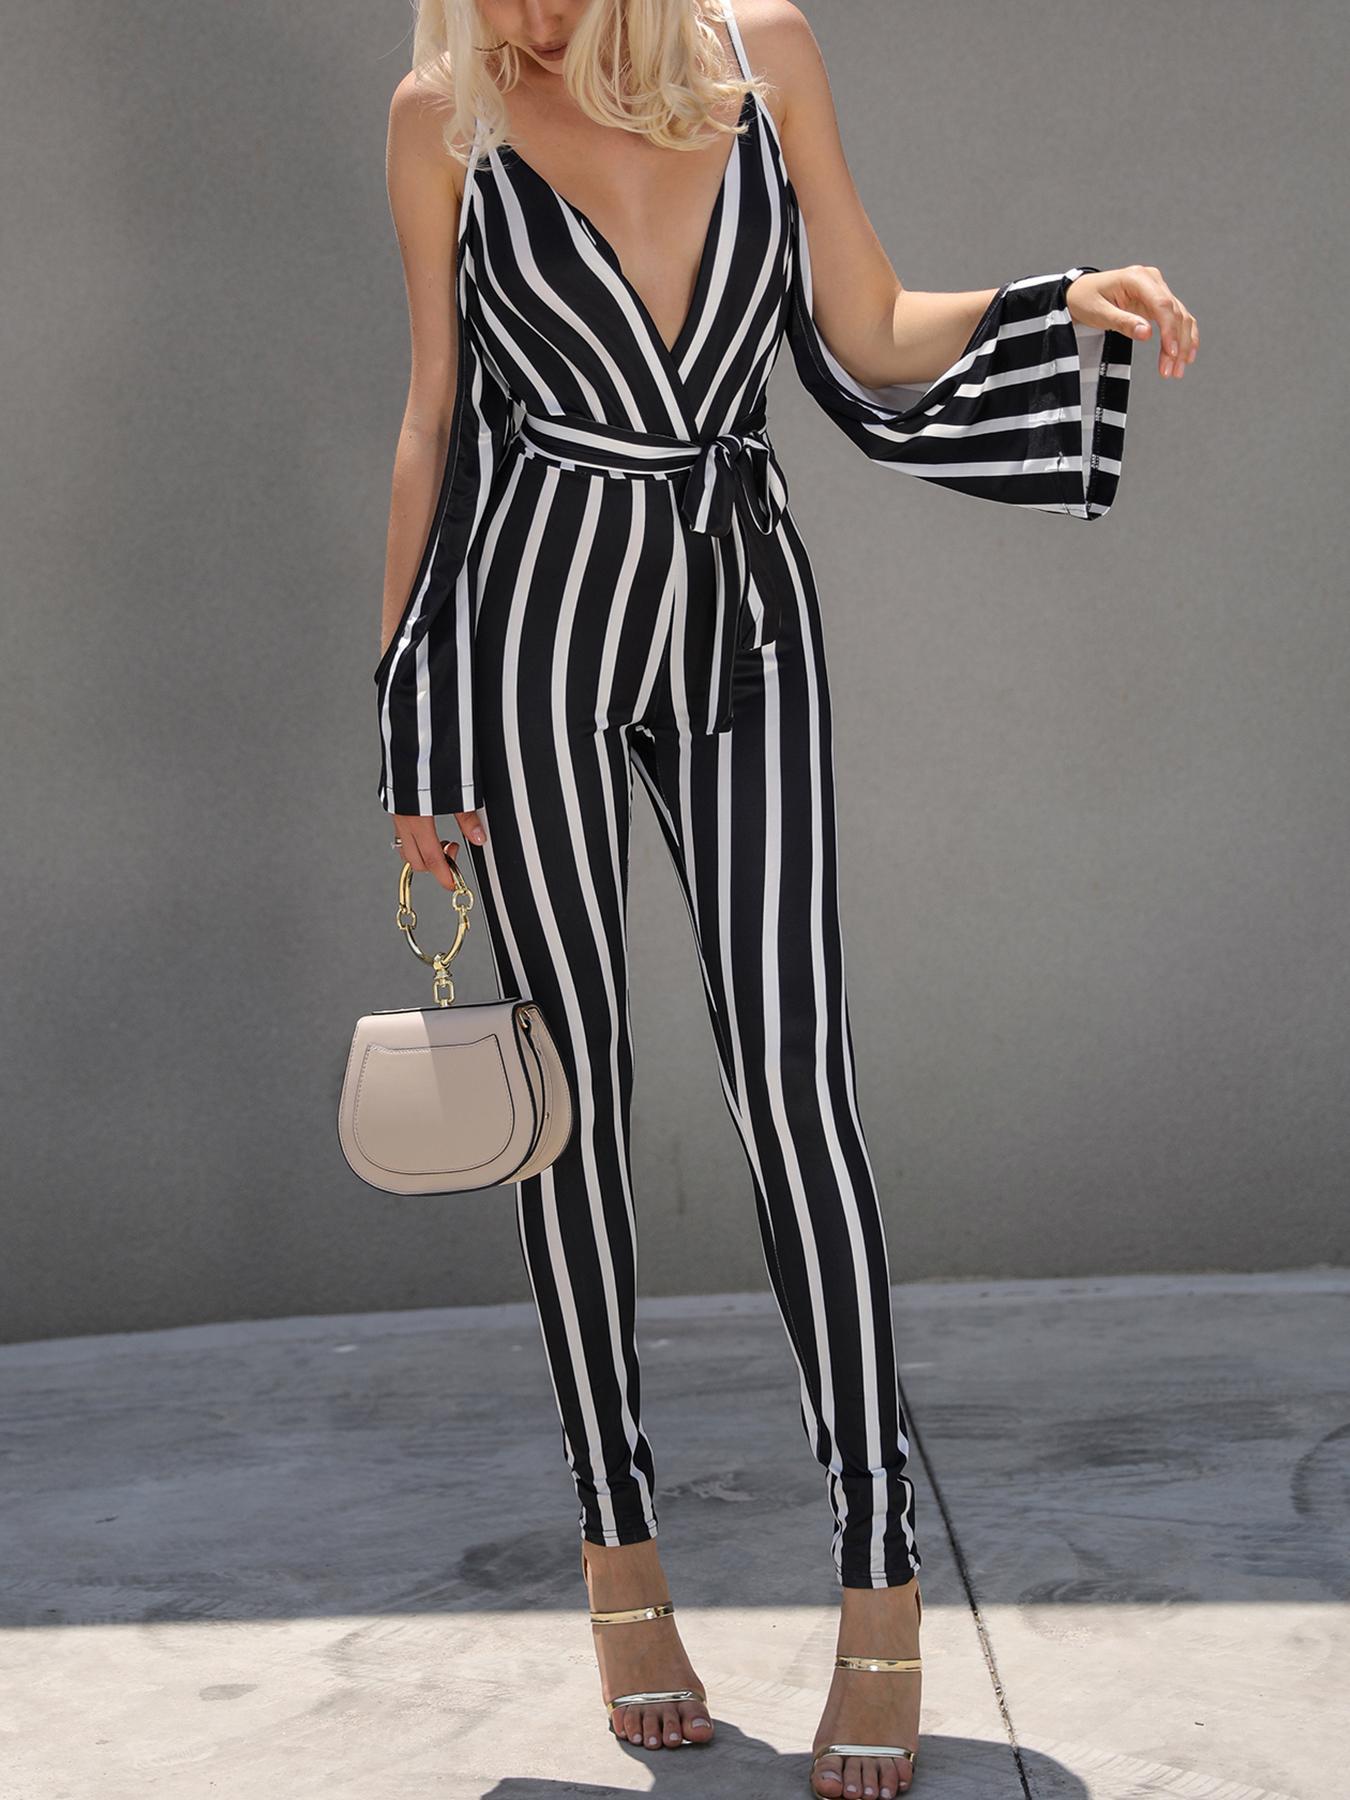 joyshoetique / Low Cut Striped Open Shoulder Tied Skinny Jumpsuit